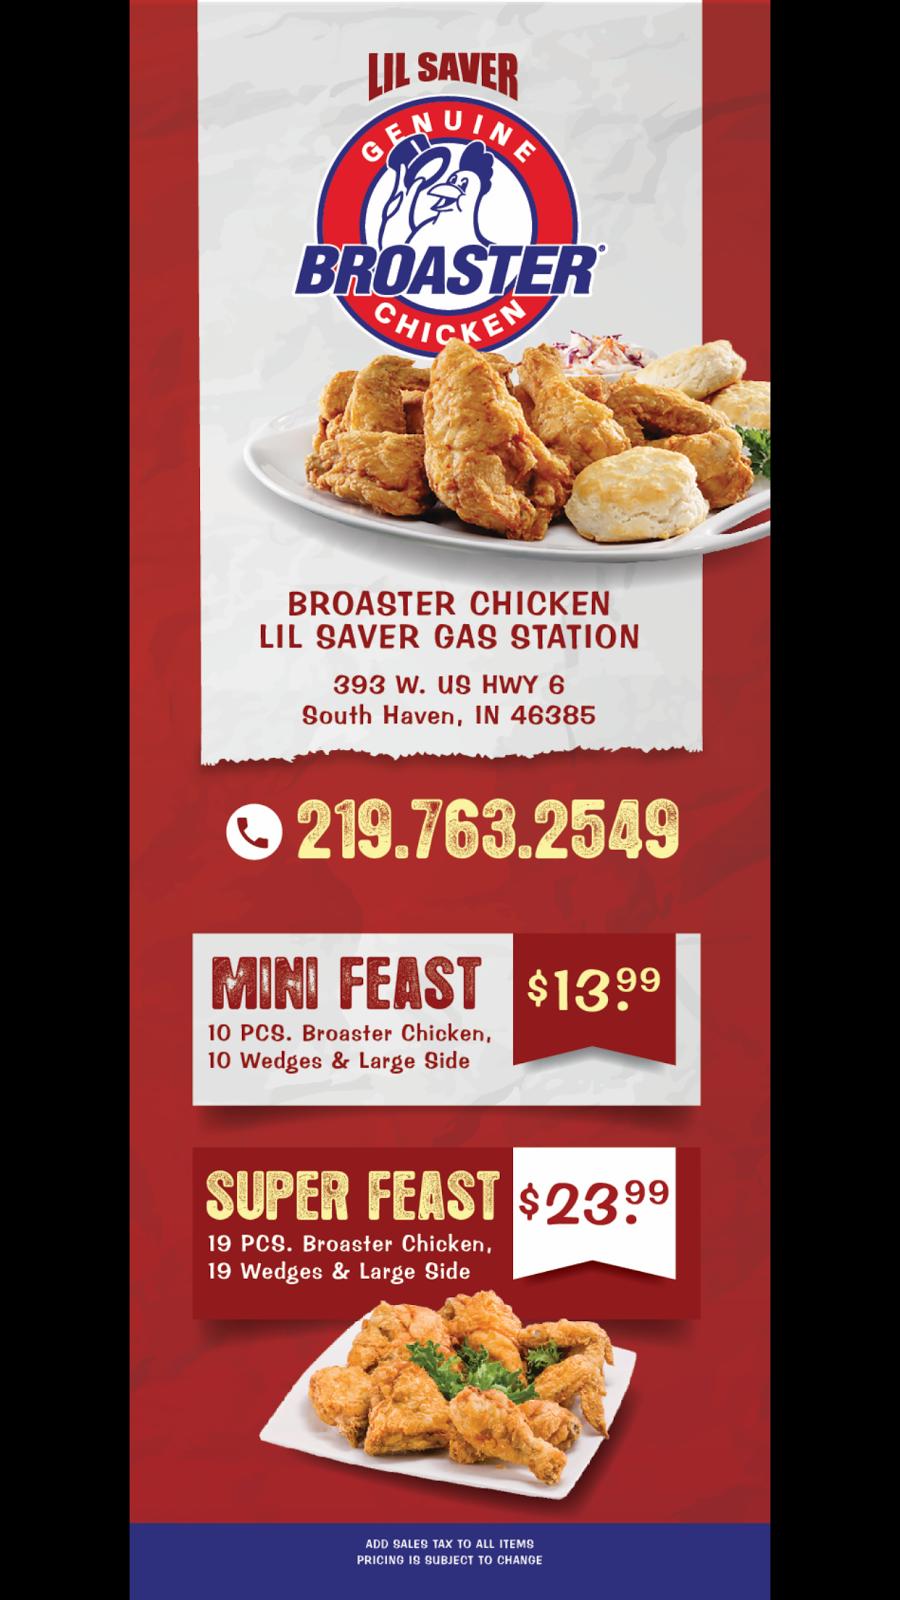 Lil Saver Broaster Chicken - gas station  | Photo 9 of 10 | Address: W, 393 US-6, Valparaiso, IN 46385, USA | Phone: (219) 763-2549